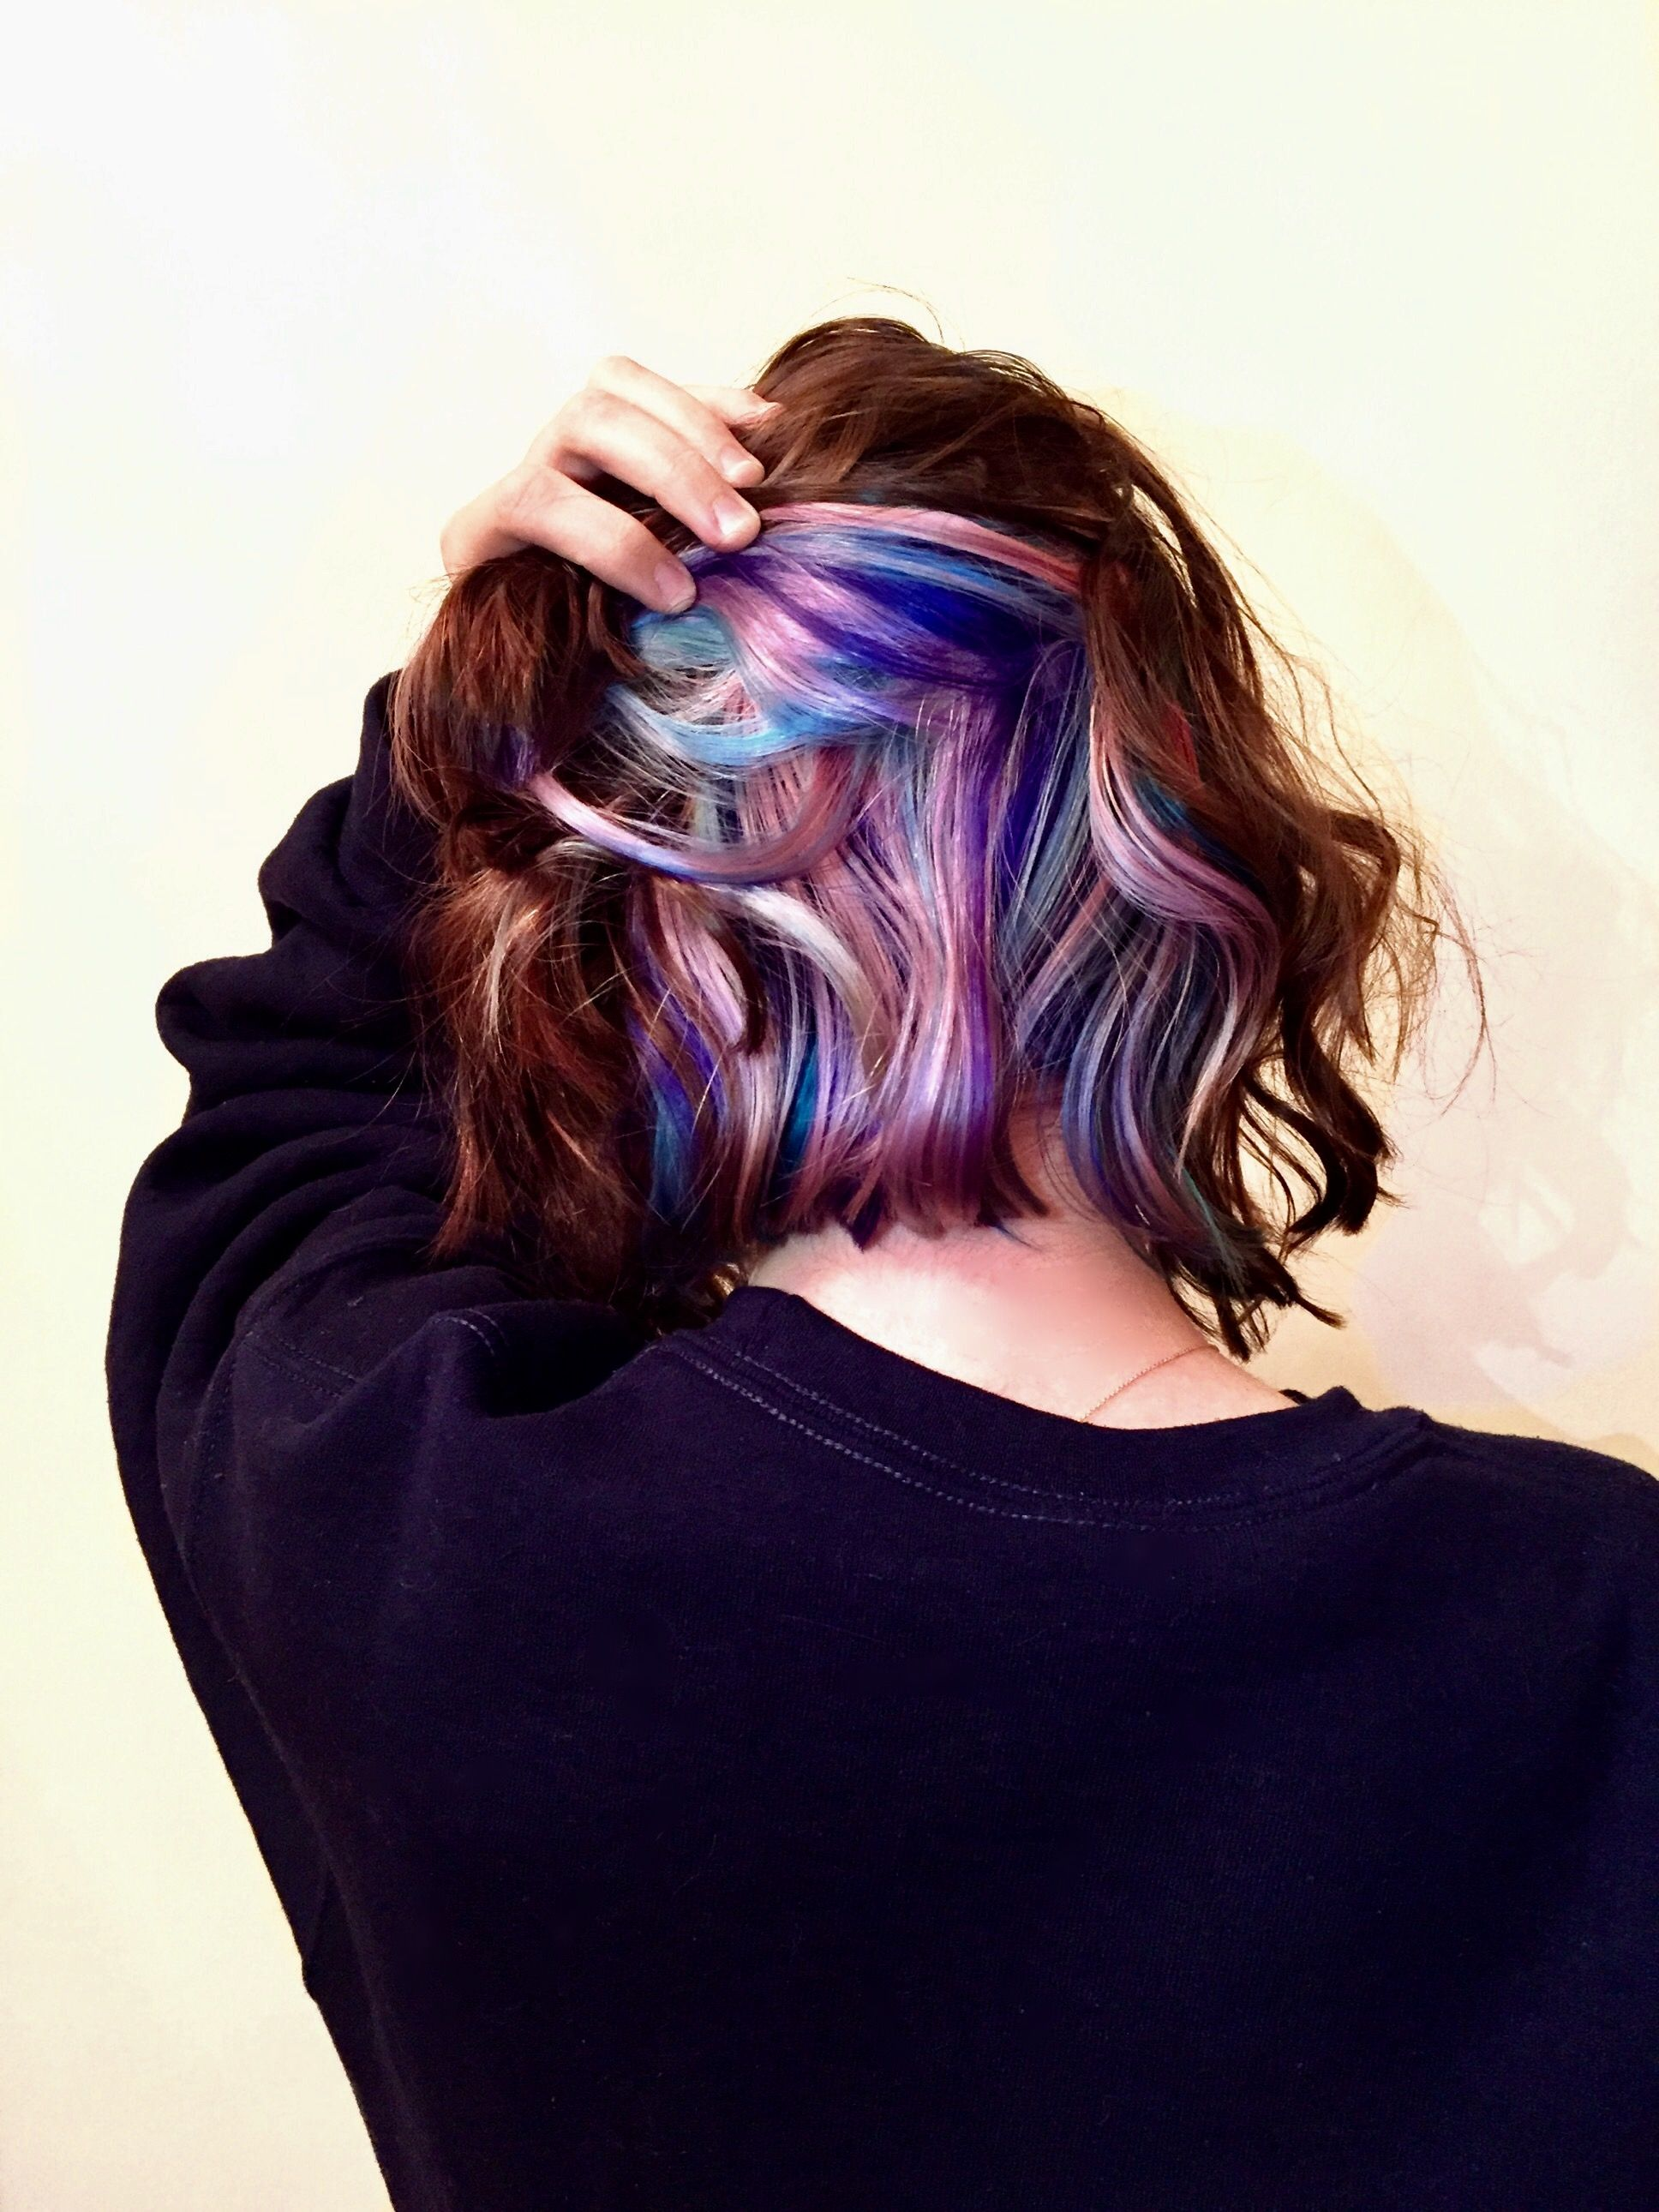 My Peekaboo Pastel Unicorn Hair ♡ Hairstyles